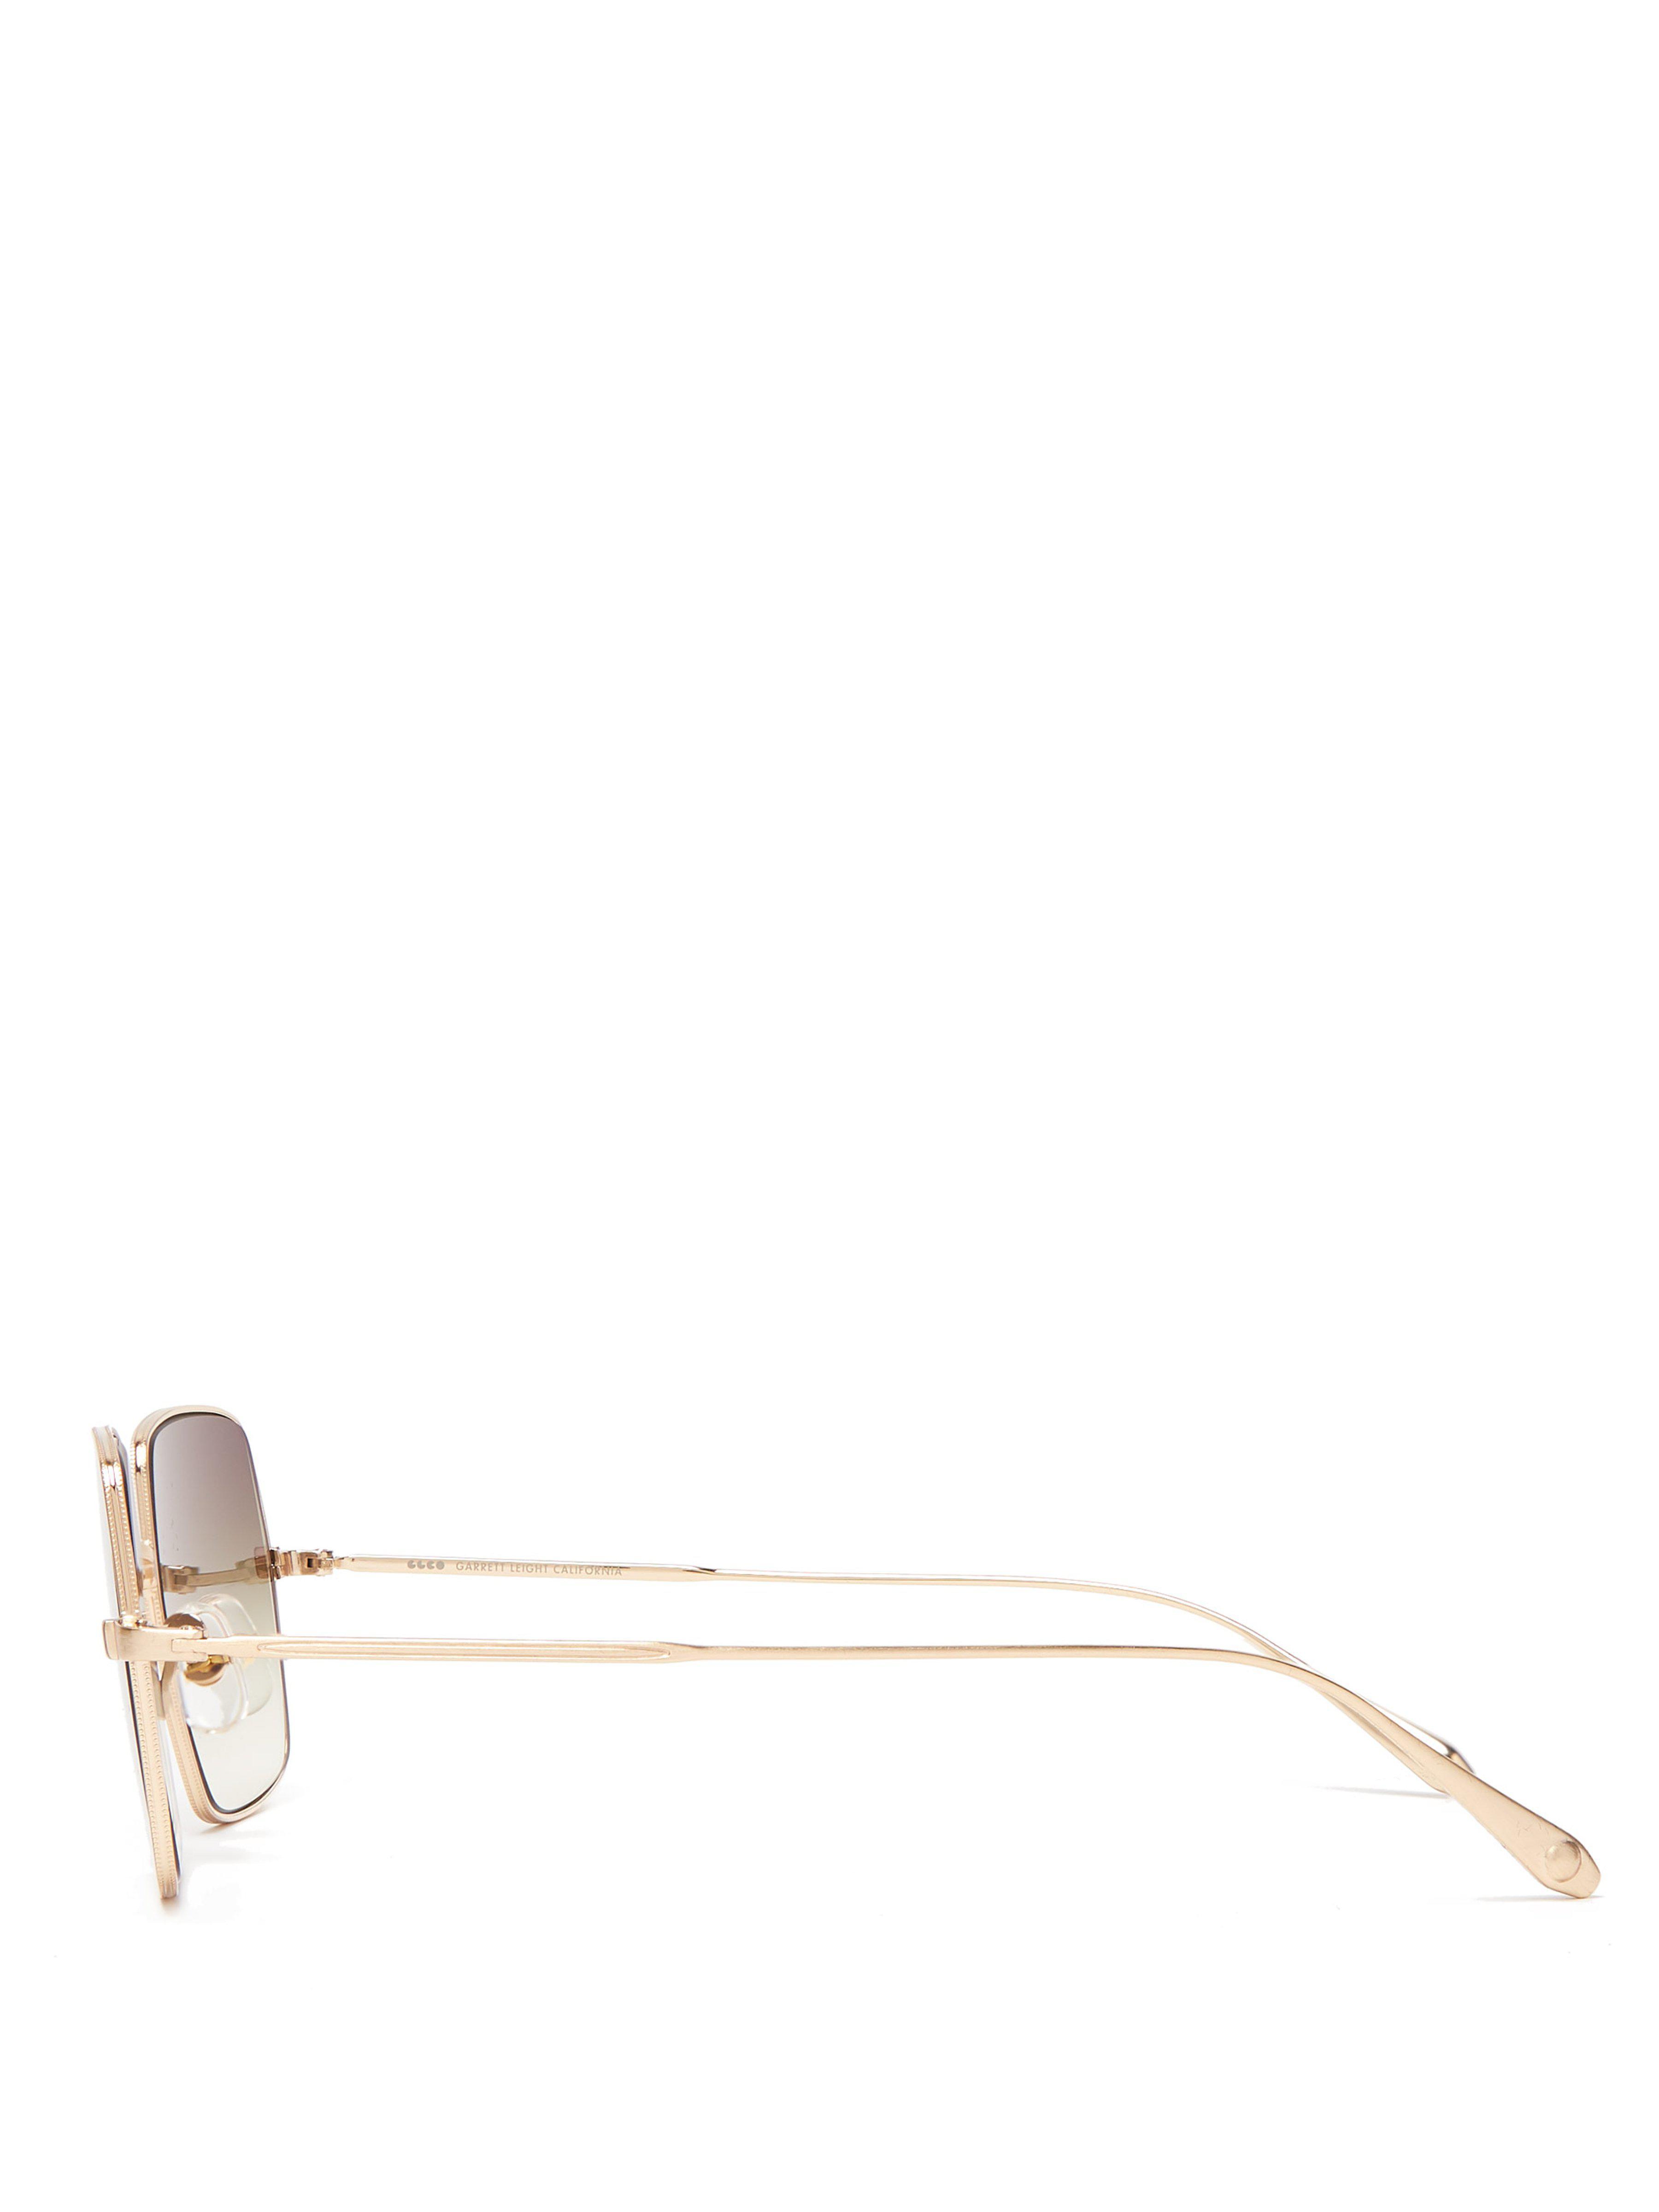 8d9a599f75 Garrett Leight Crescent Square Frame Sunglasses in Green - Lyst